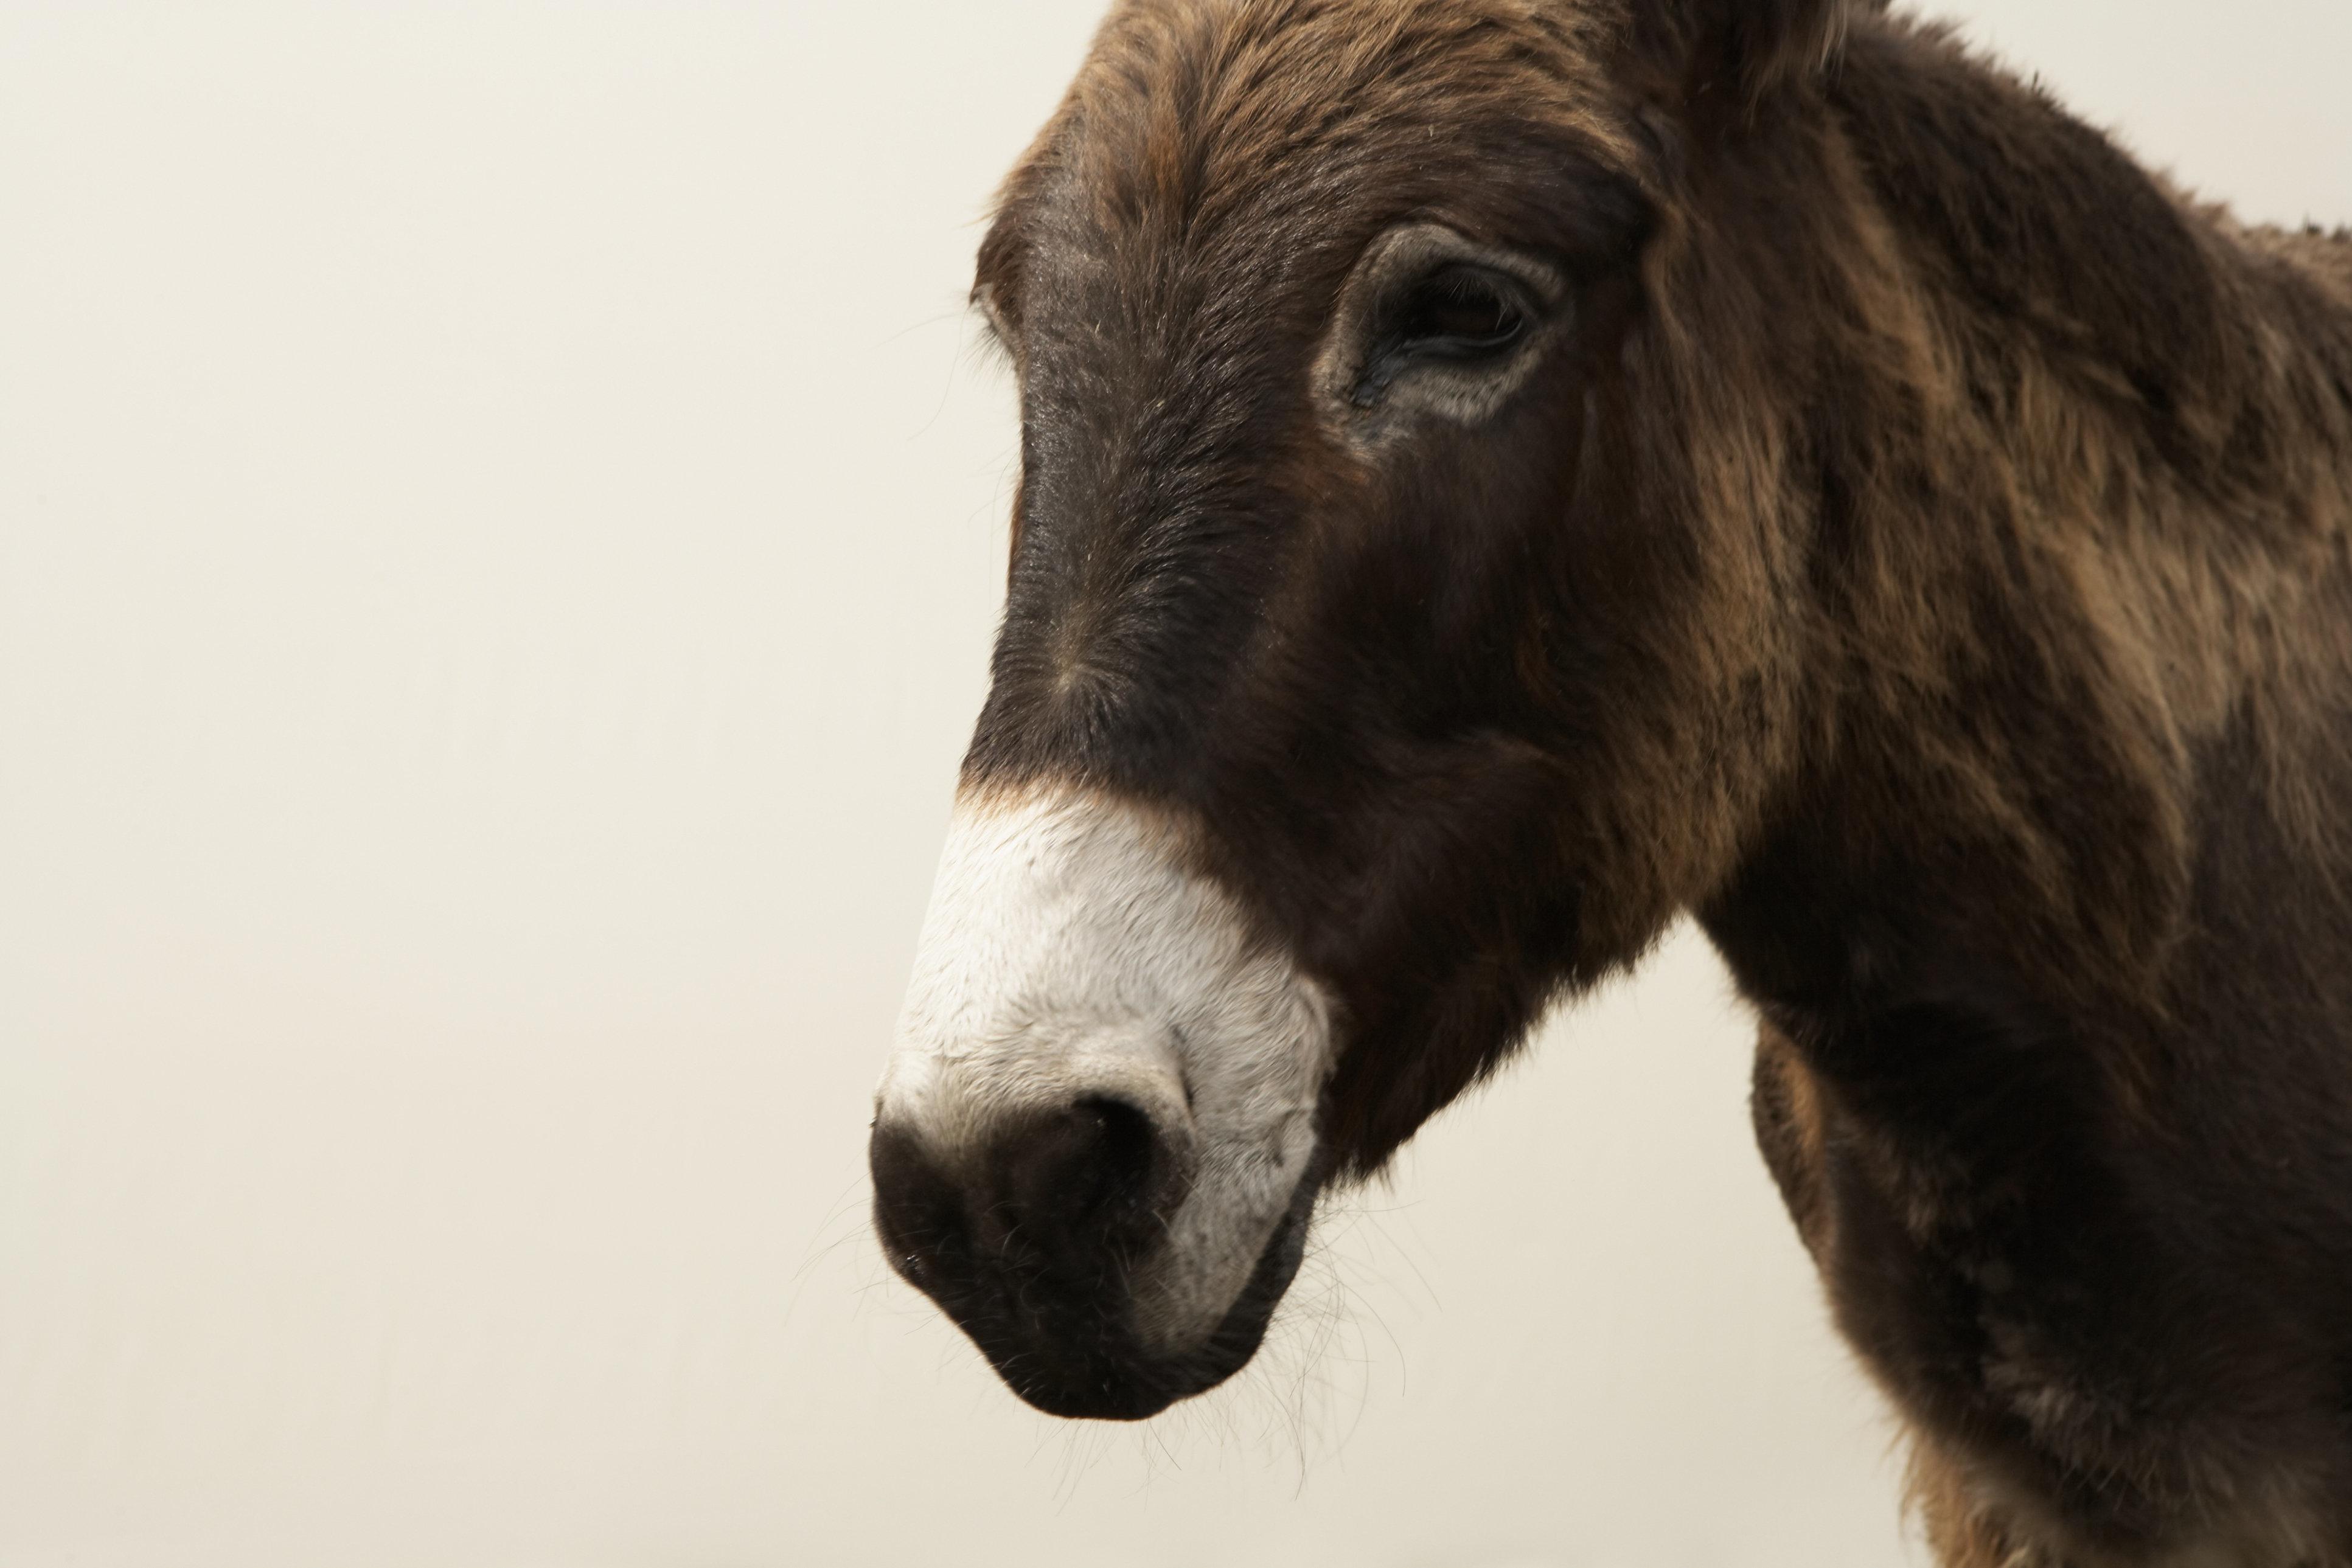 Is Donkey's Milk The Next Big Health